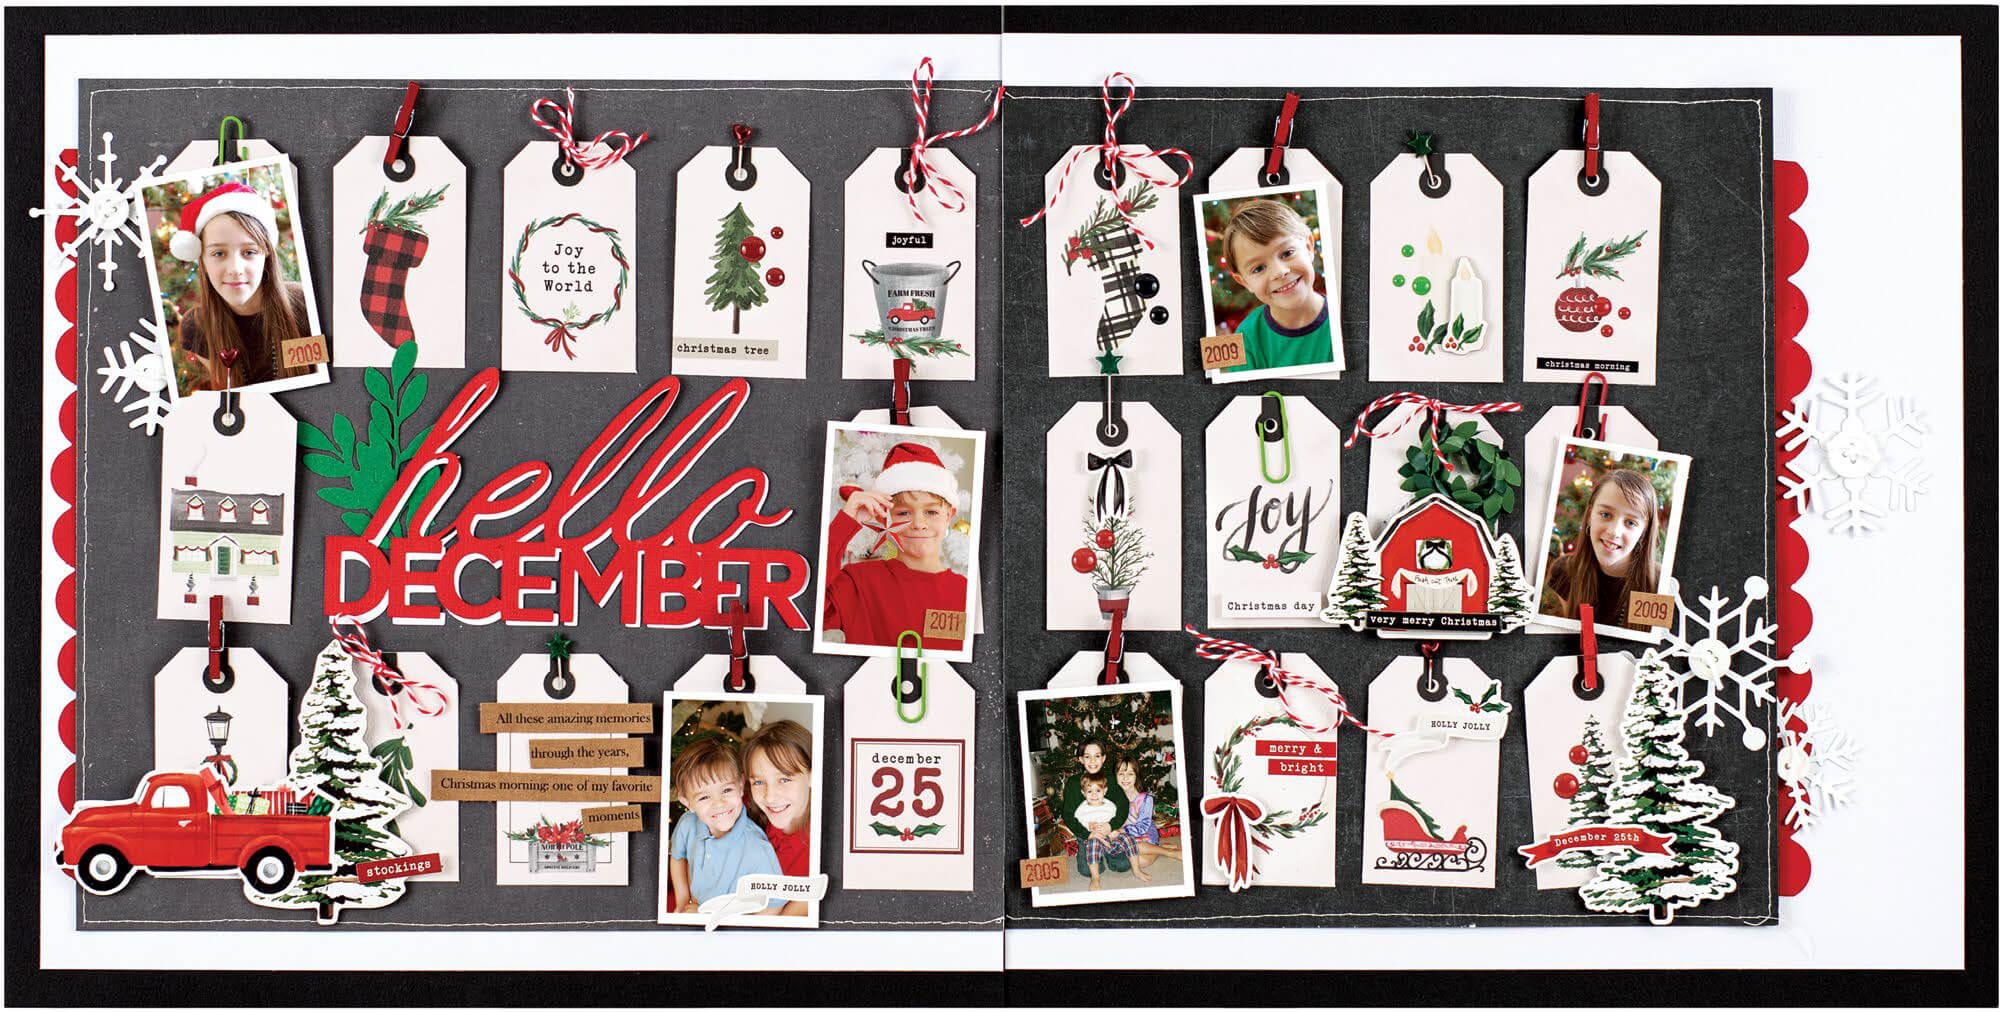 Scrapbook & Cards Today - Winter 2019 - Hello December layout by Jennifer S Gallacher